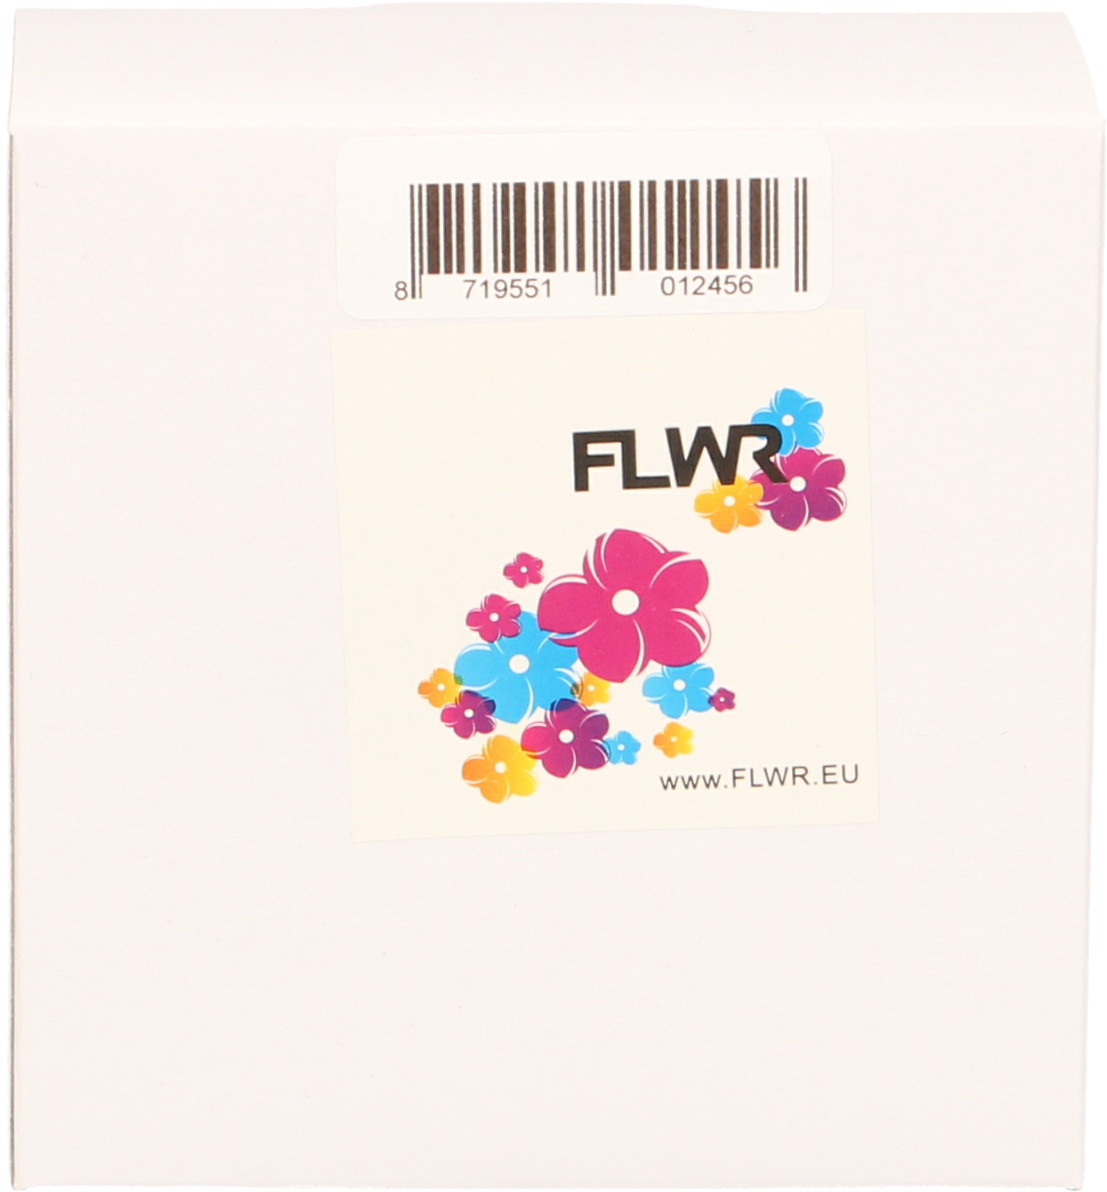 FLWR Brother DK-22214 wit